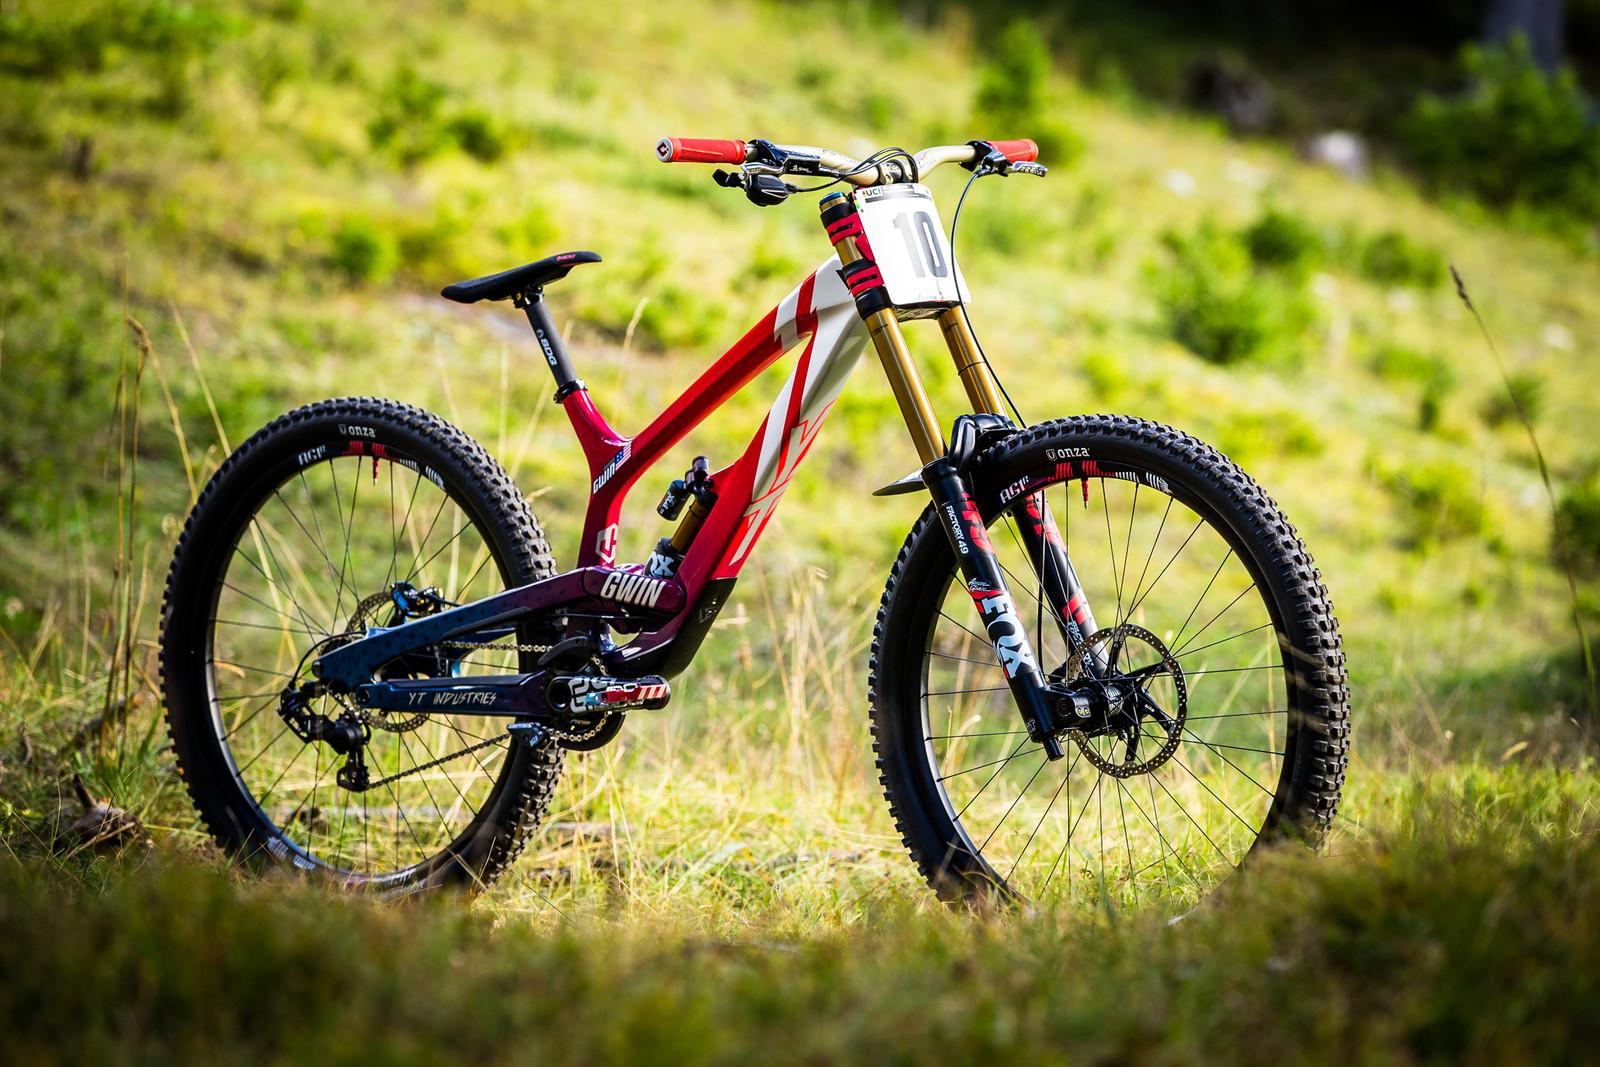 Aaron Gwin's Big Wheeled YT TUES World Champs Bike - WORLD CHAMPS BIKE - Aaron Gwin's YT TUES - Mountain Biking Pictures - Vital MTB